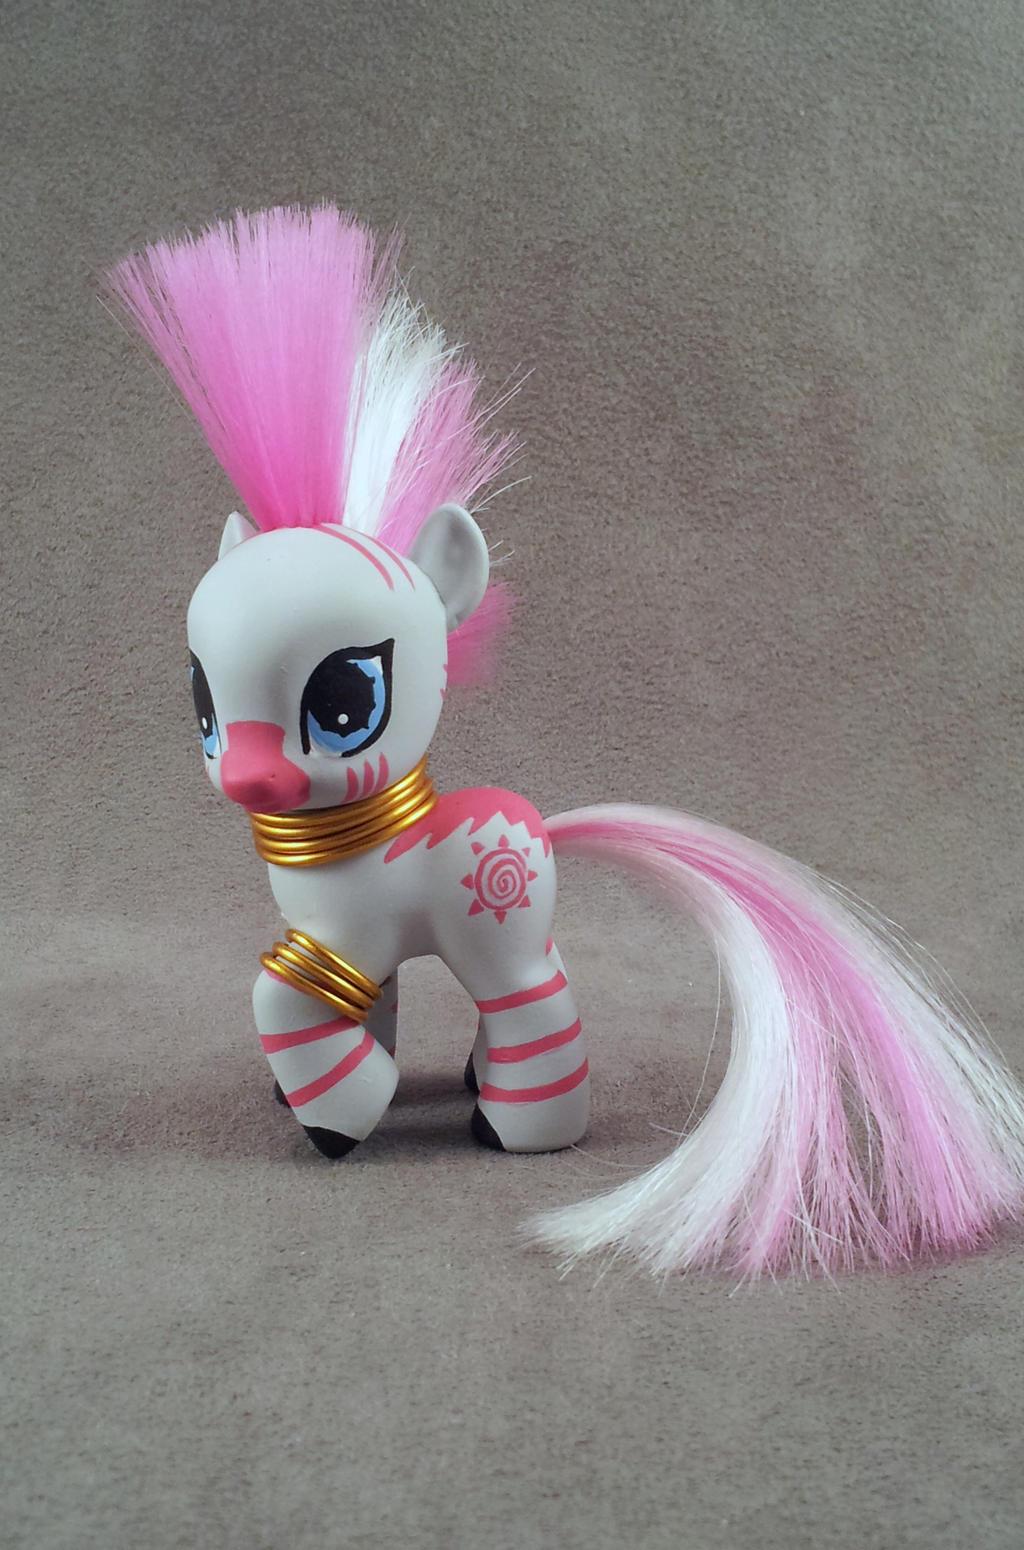 Pink filly Zecora custom MLP:FiM by hannaliten